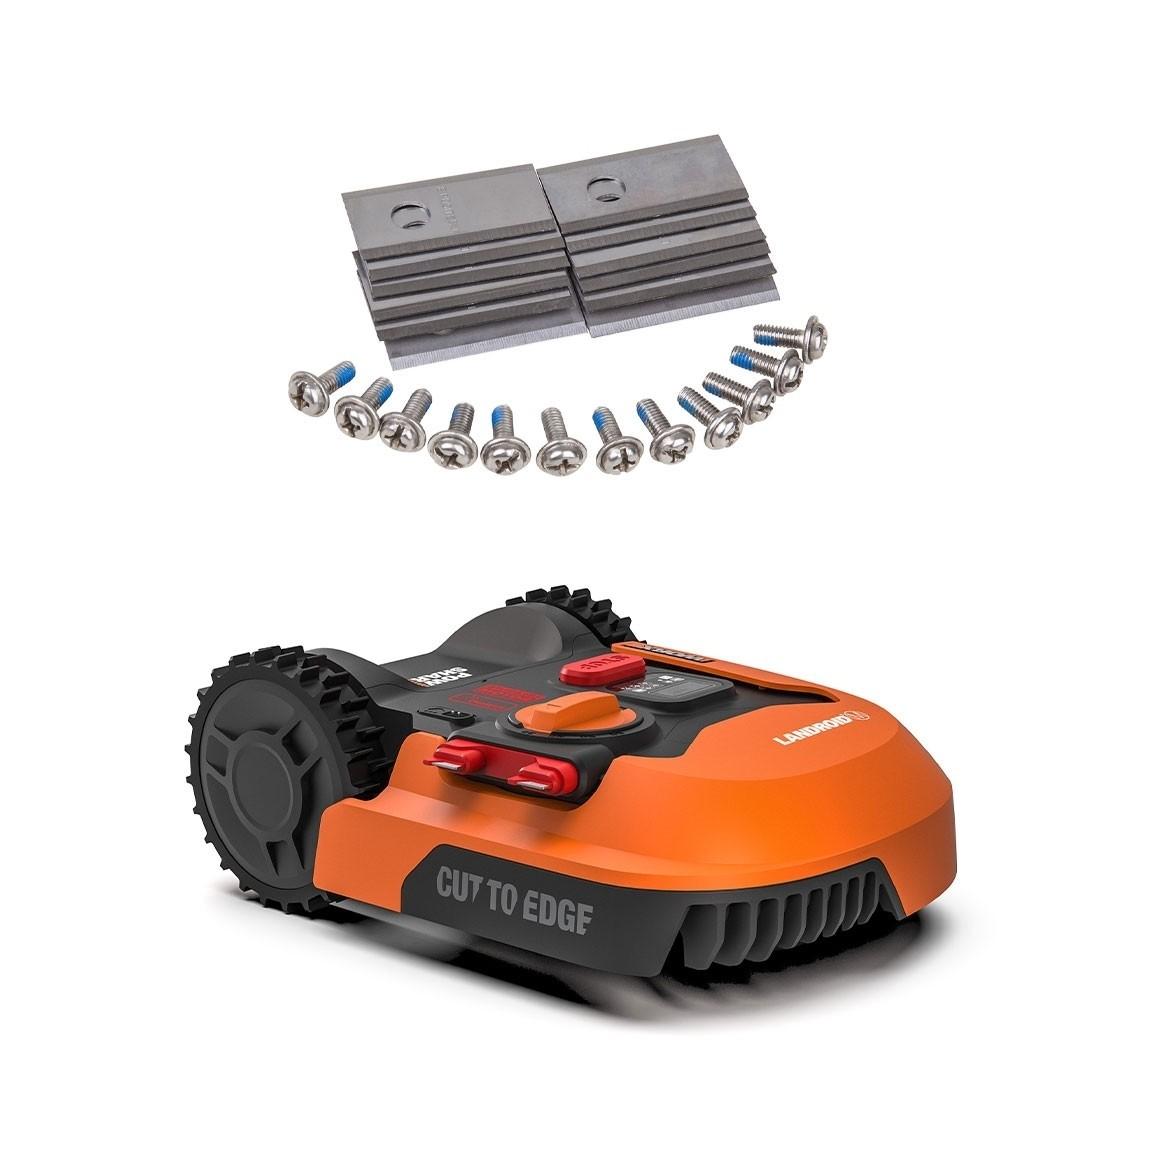 Worx Landroid M1000 - Mähroboter - Modell 2019 + gratis Ersatzmesser